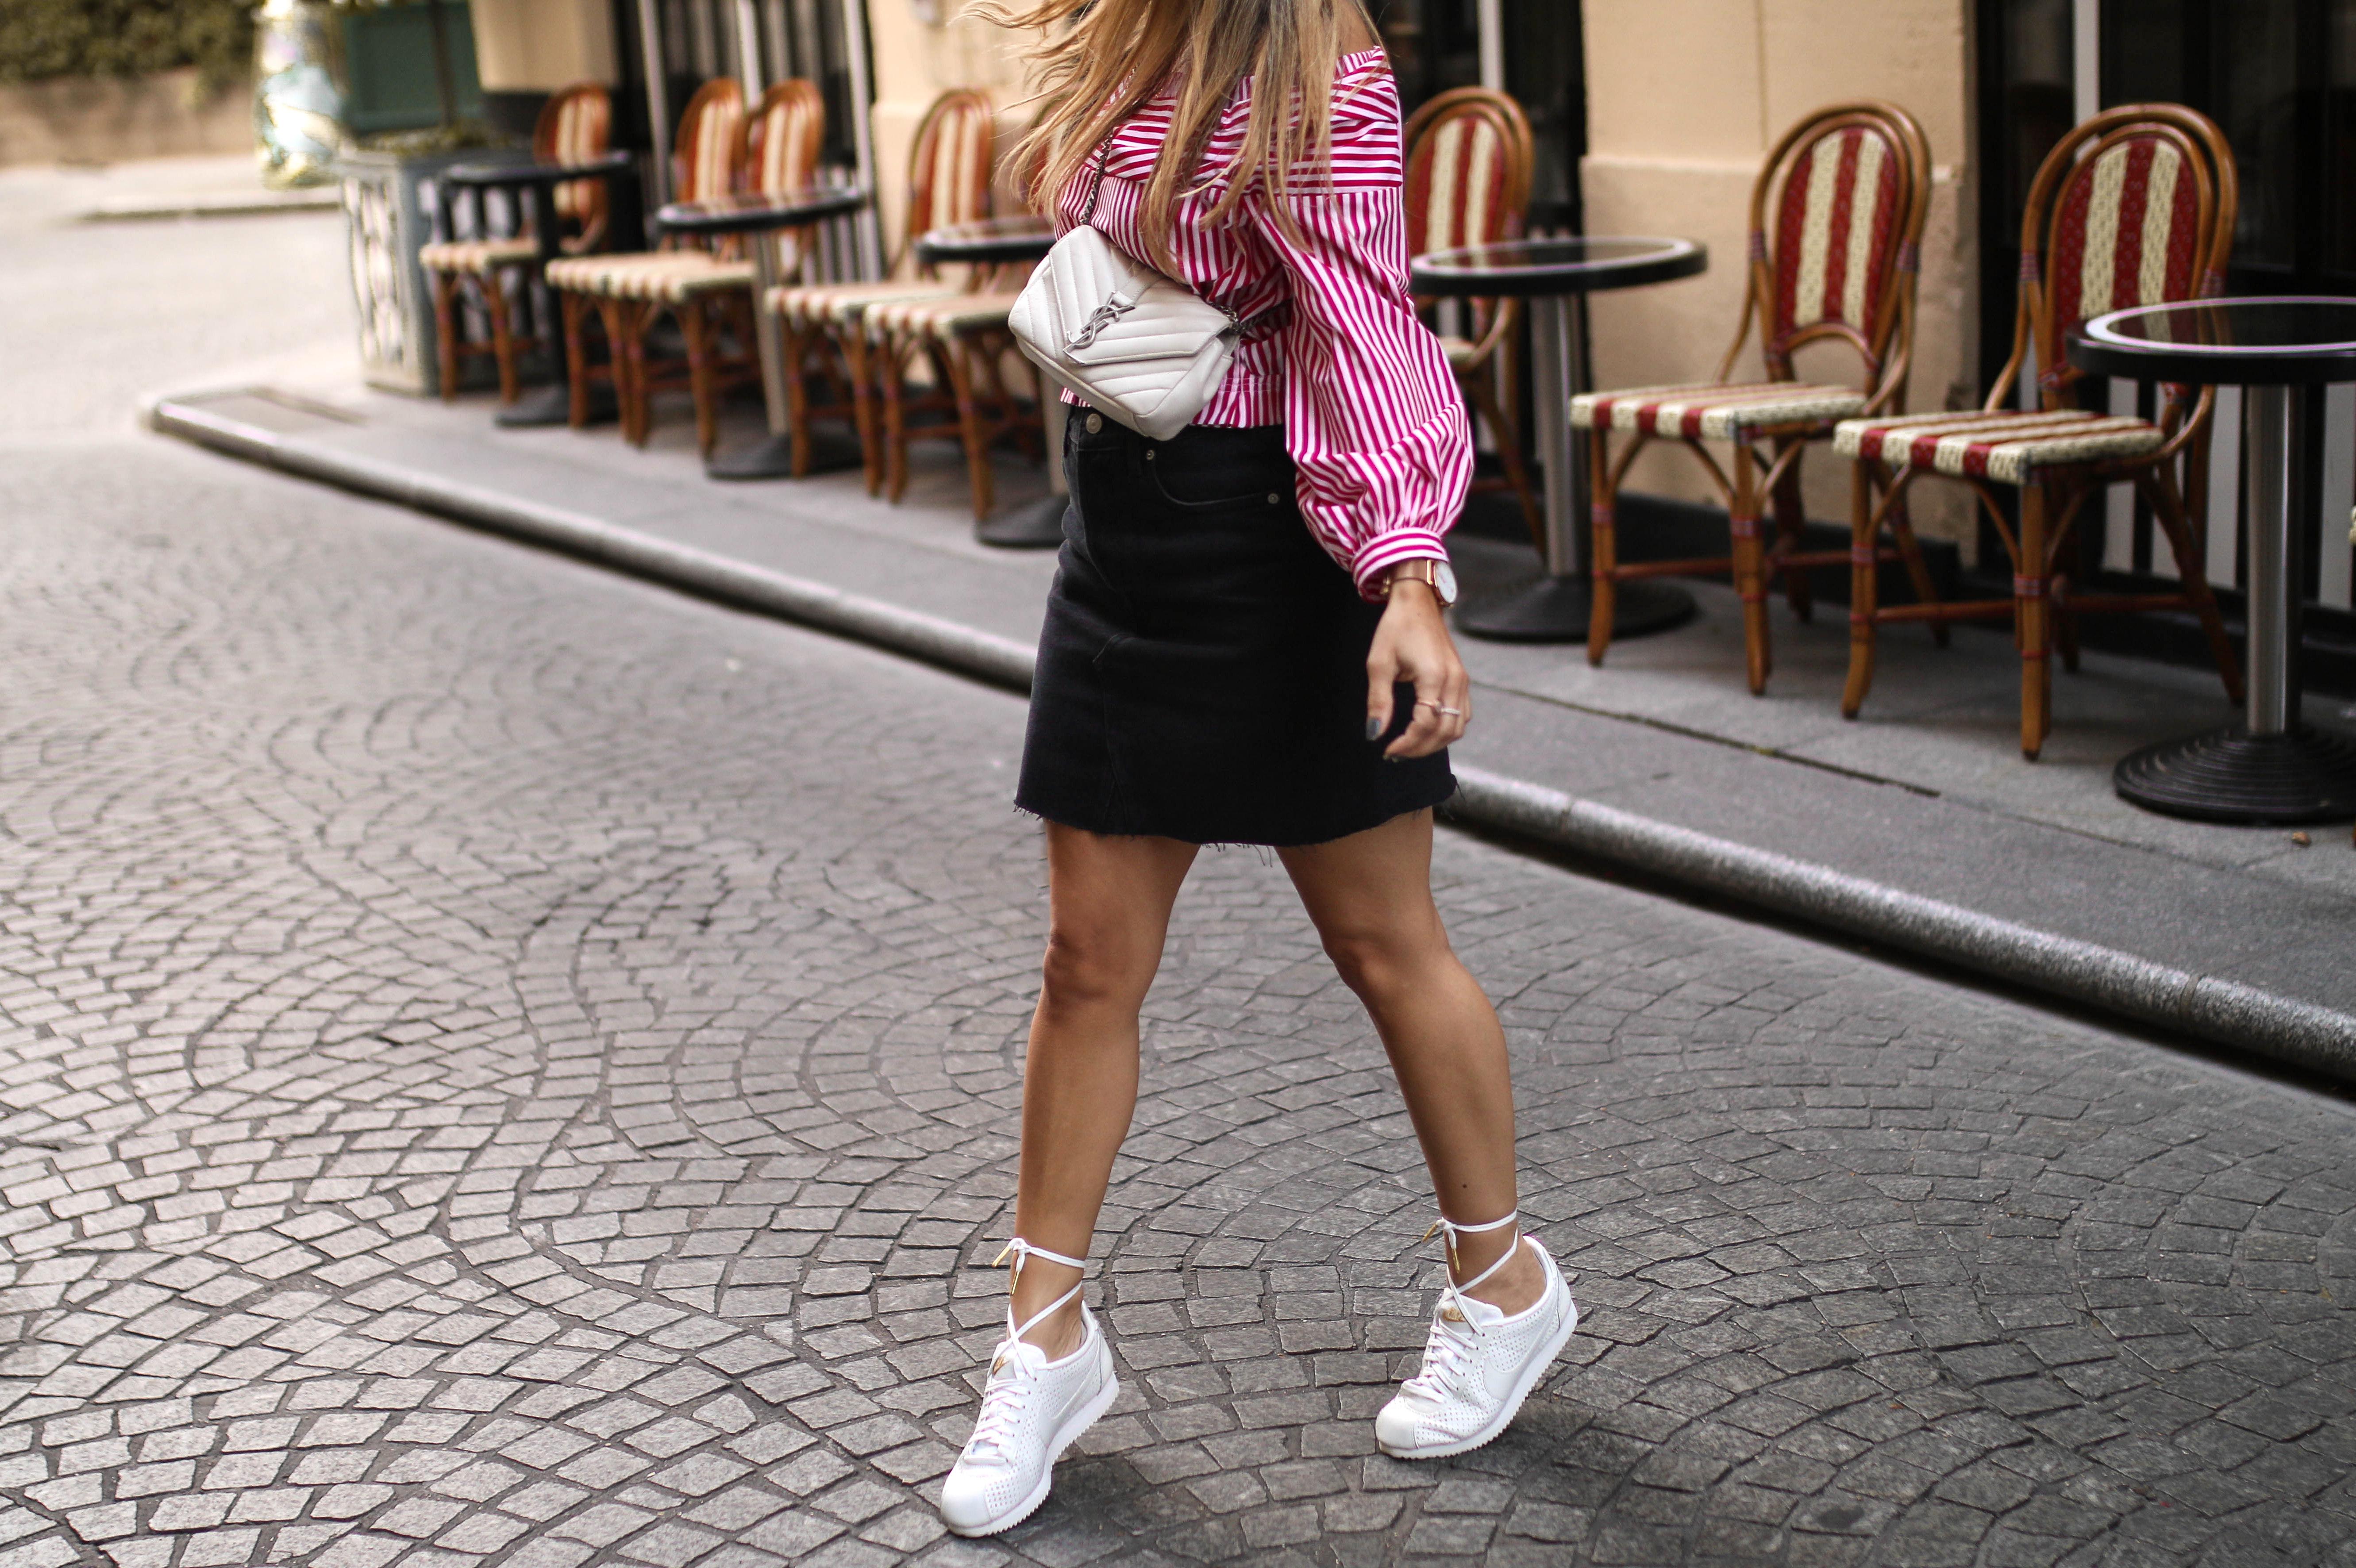 nike cortez sneaker streetstyle saint laurent ysl monogramme bag fashion blog outfit inspo pinterest